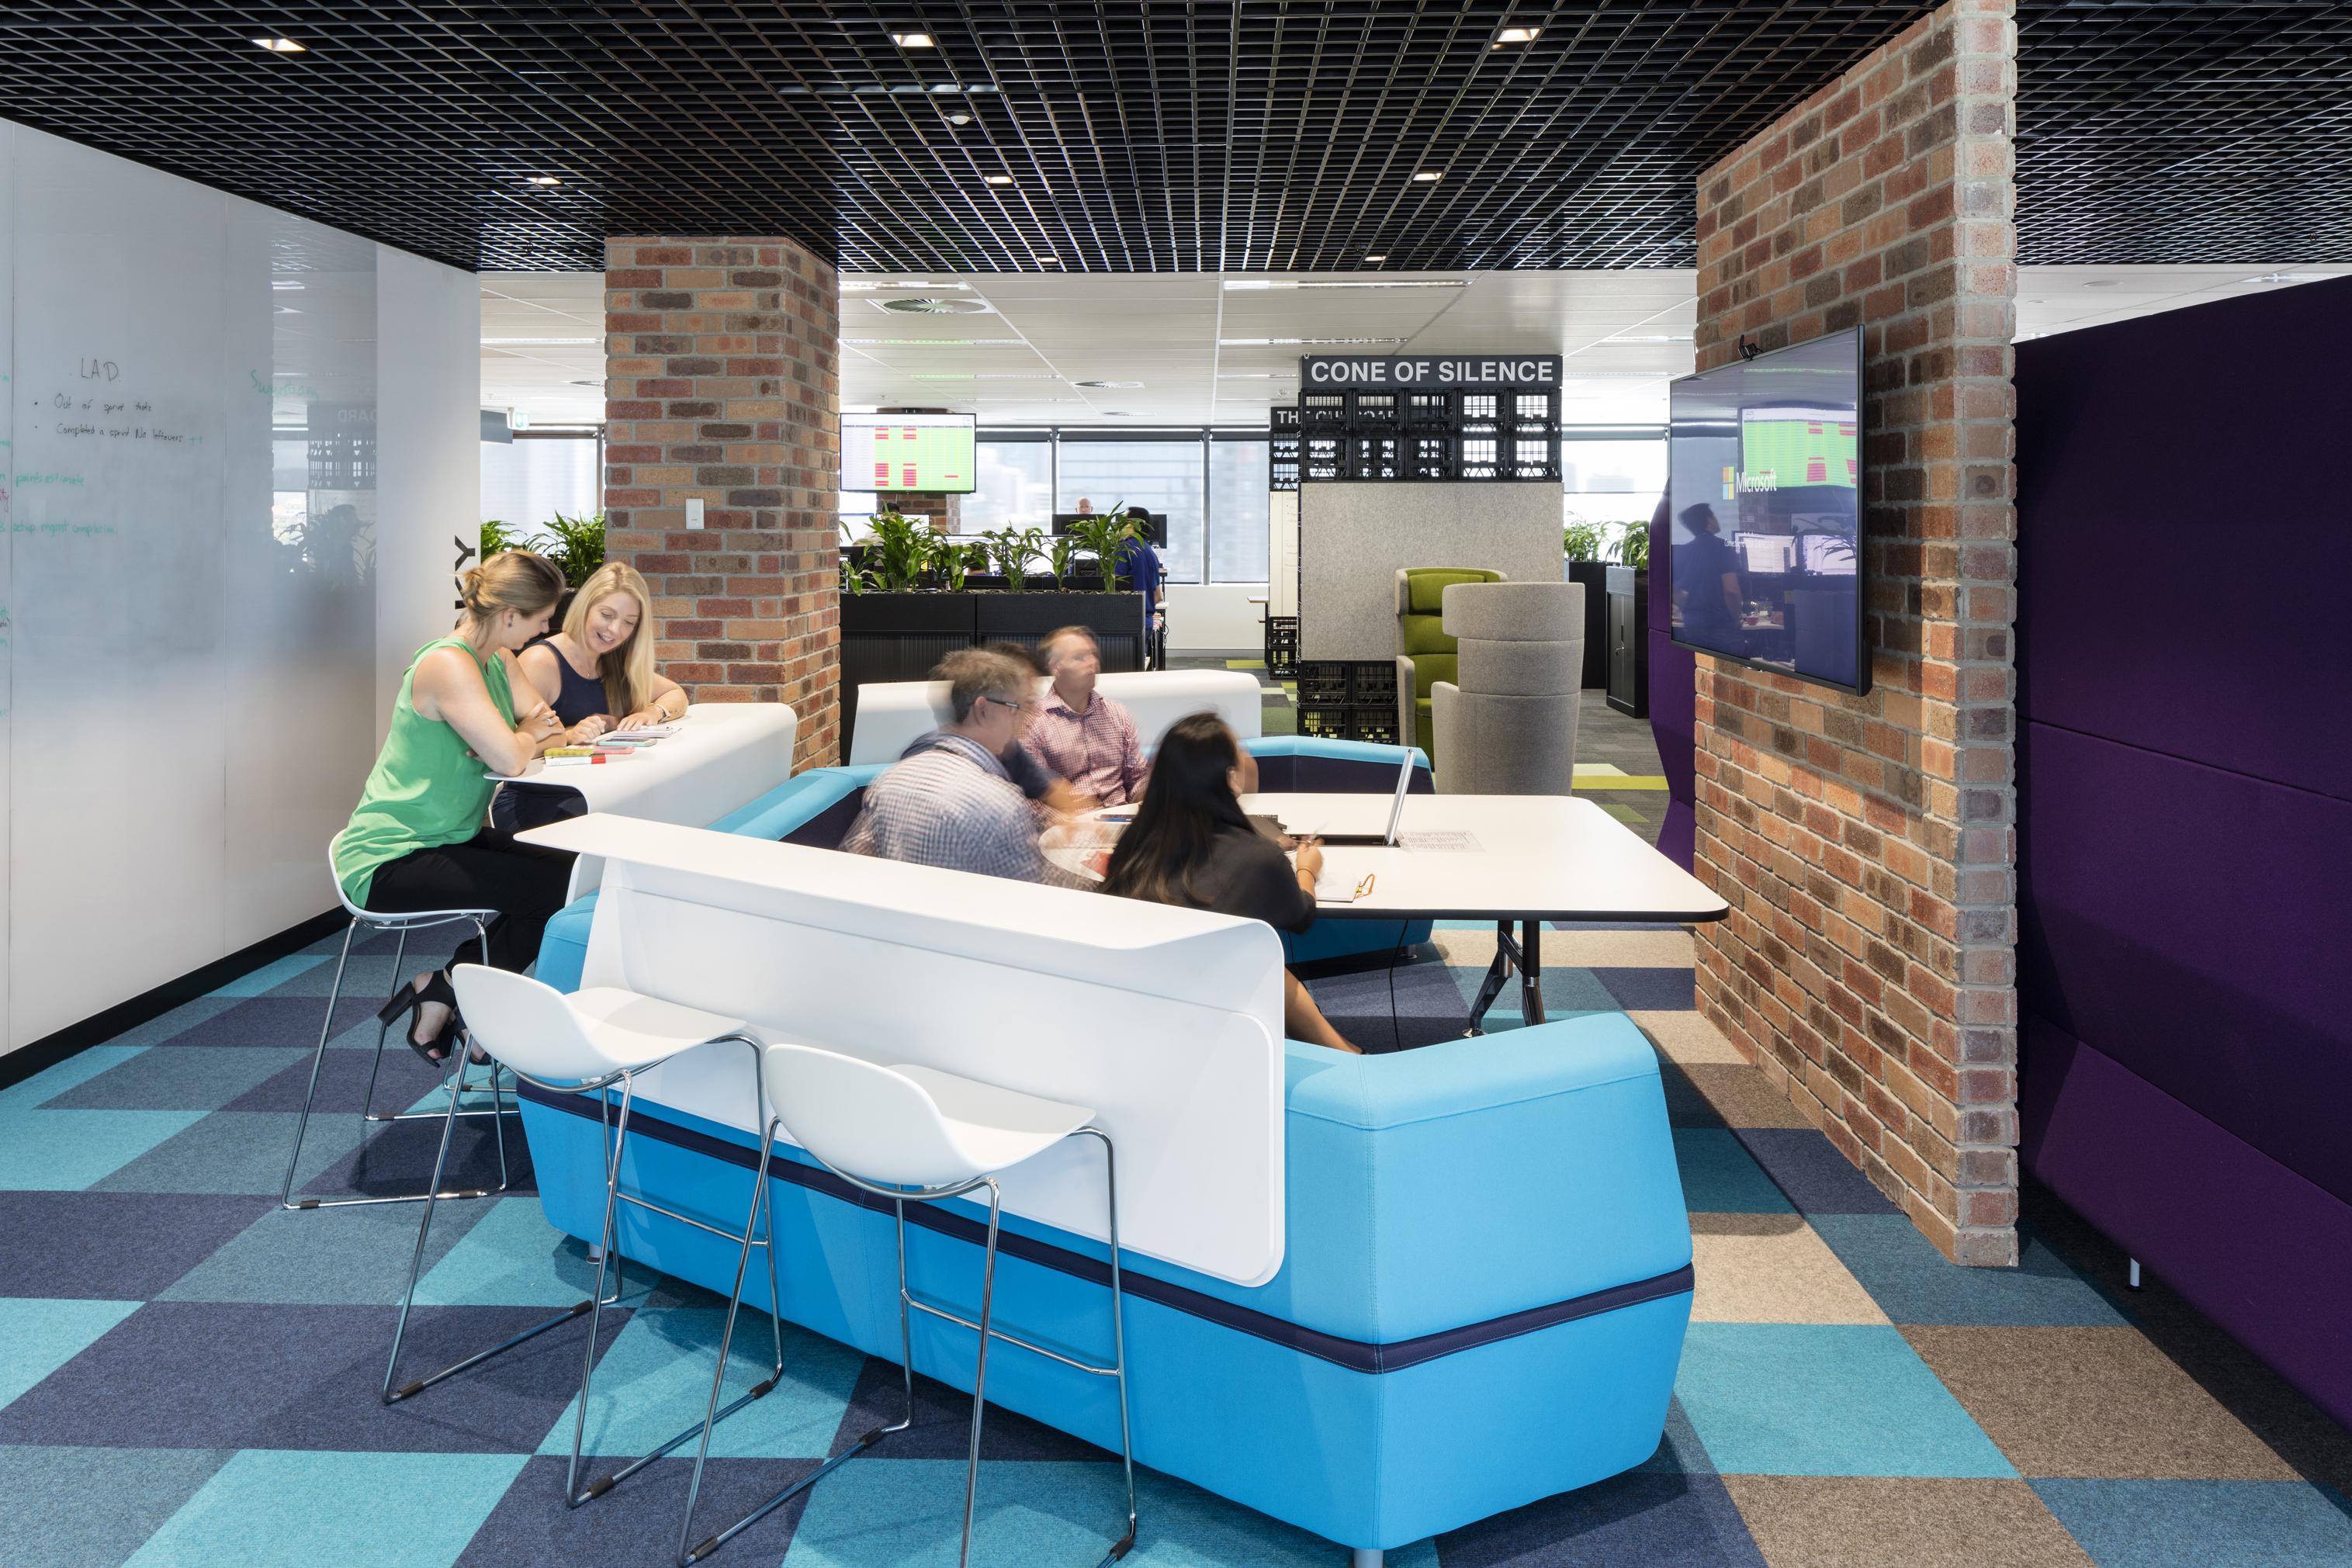 Melissa-Marsden2 Melissa Marsden: An Interior Designer Focussed on Workplace Design & The Bottom Line Design Future of Work Leadership